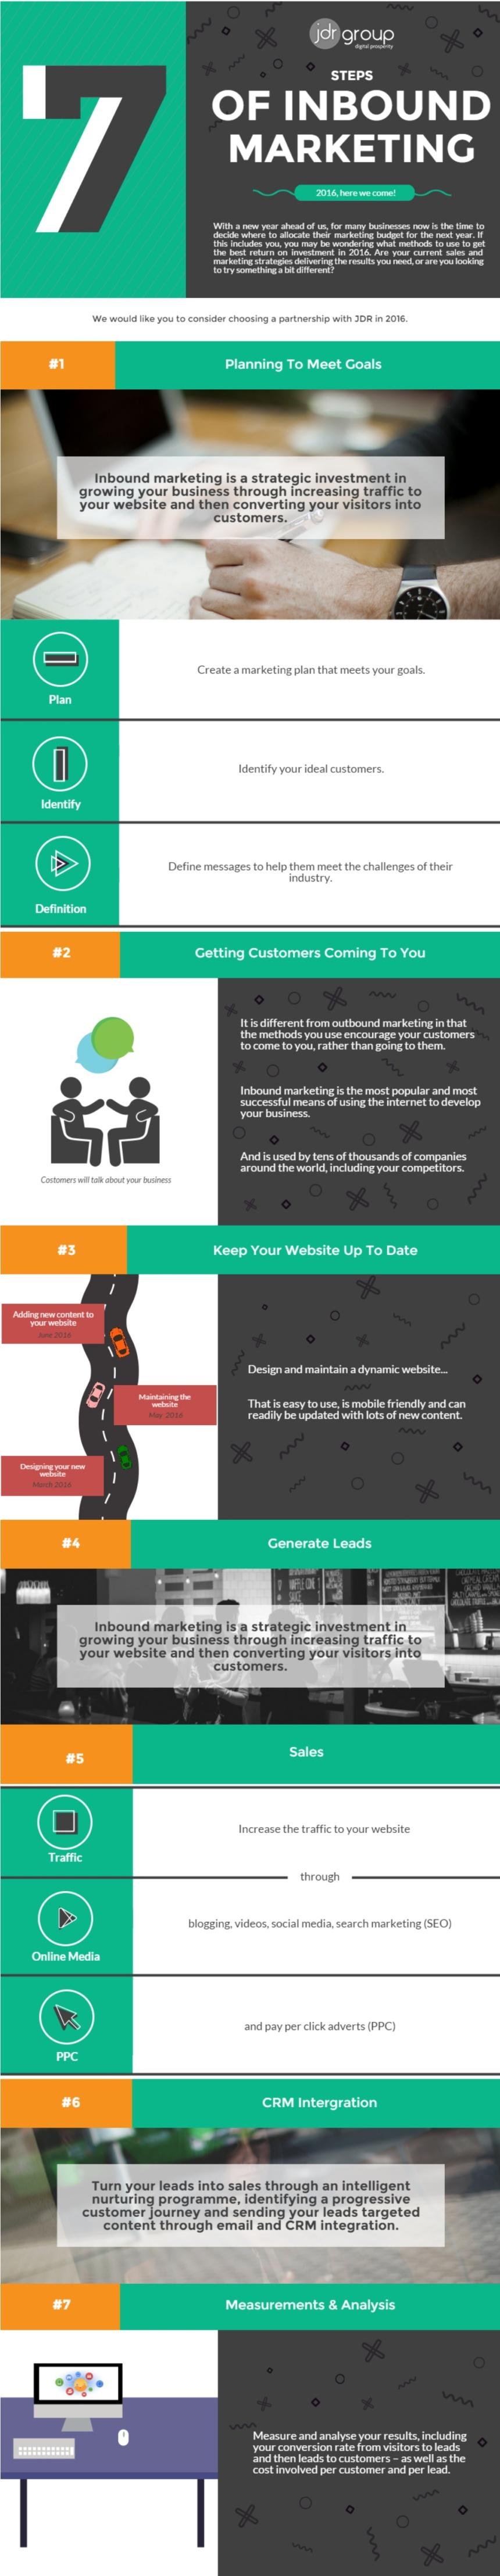 7 pasos para Inbound Marketing